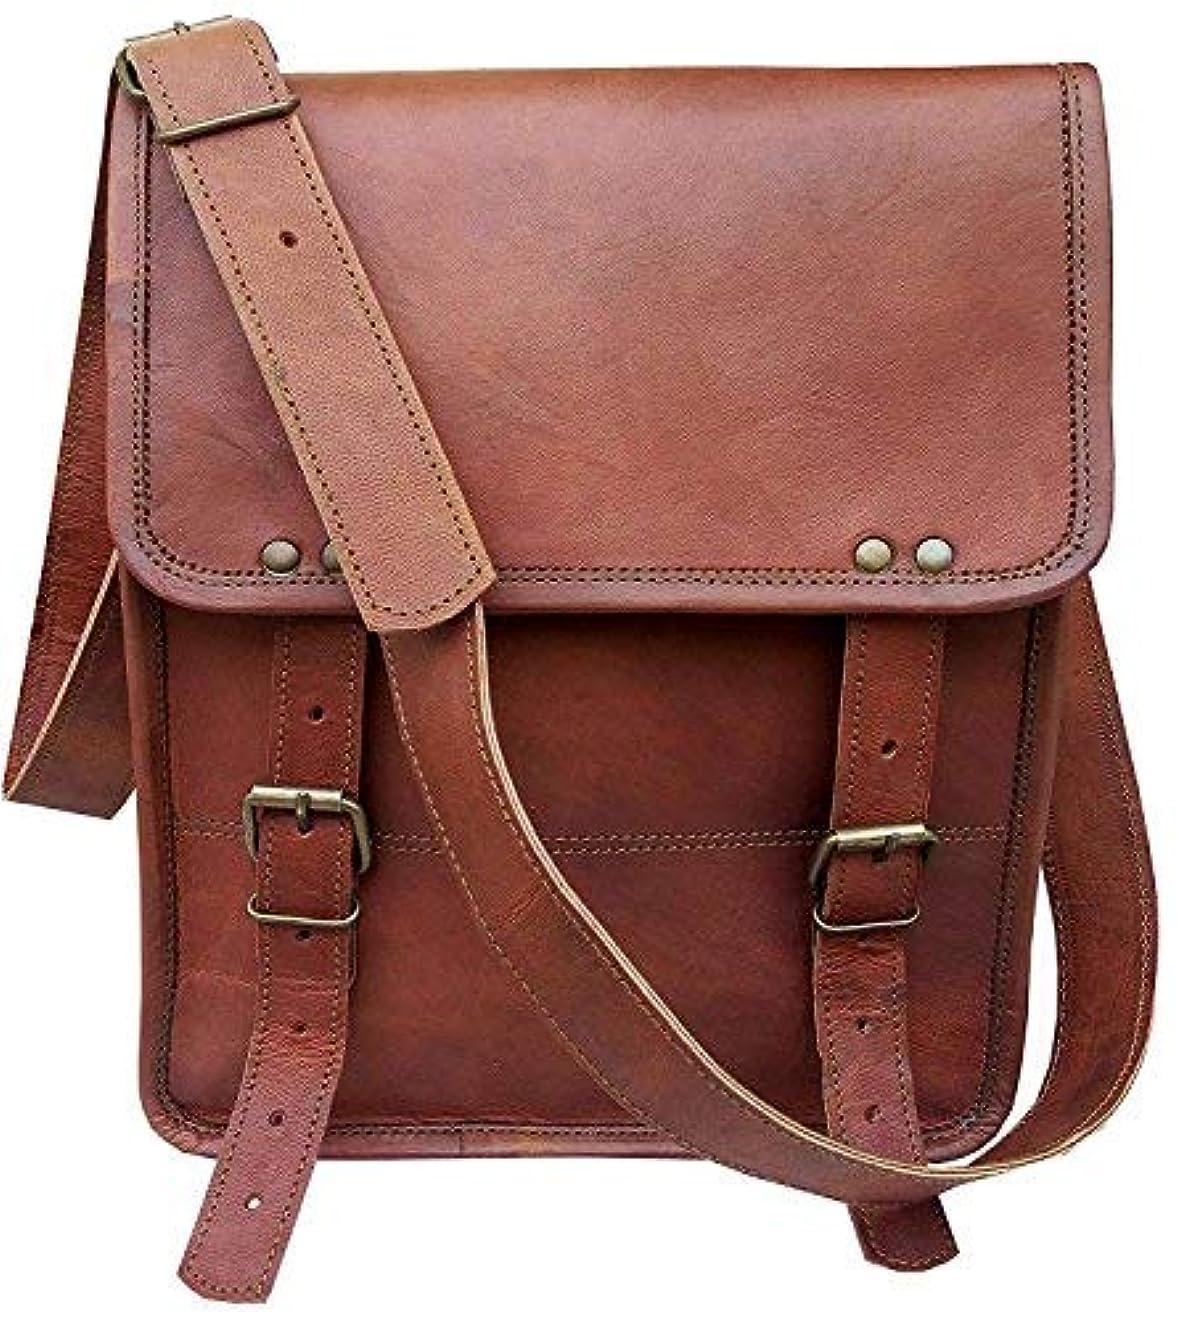 Vintage leather 11 Inch Handmade Standing Ipad Tablet Leather Messenger Satchel Bag